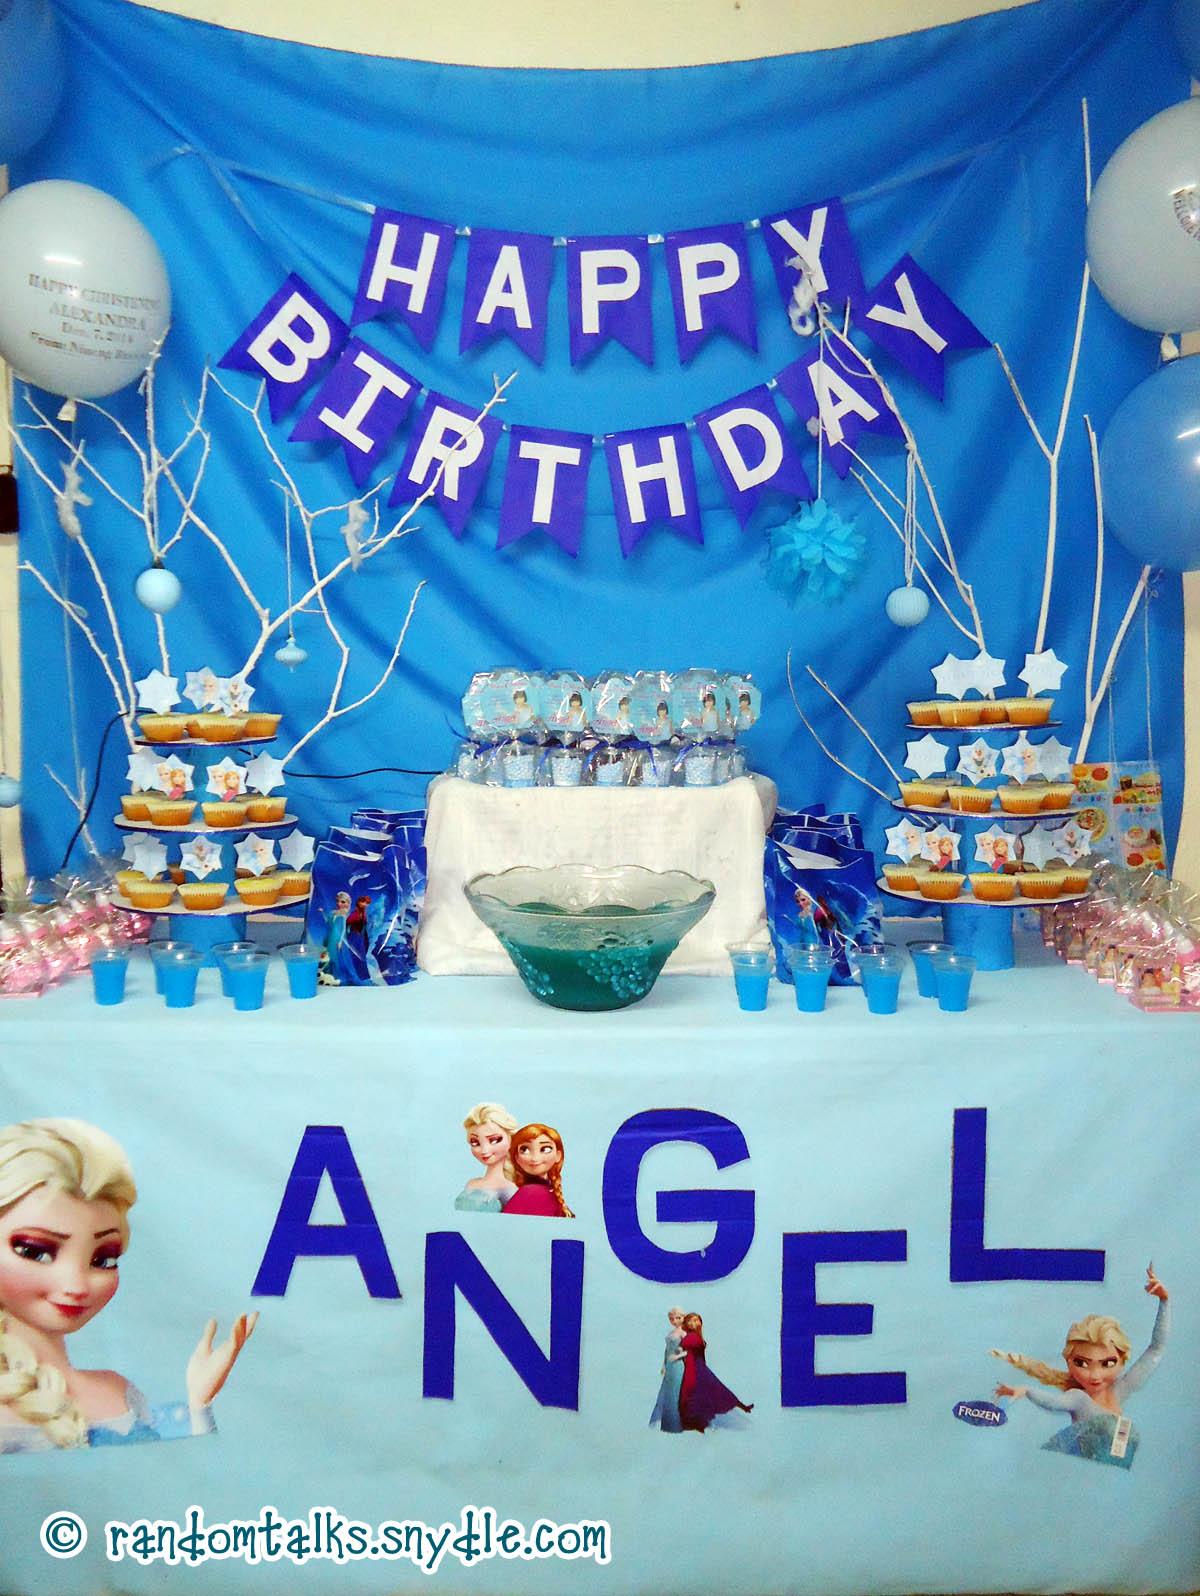 My Frozen Birthday Party Ideas Under $100 - Random Talks